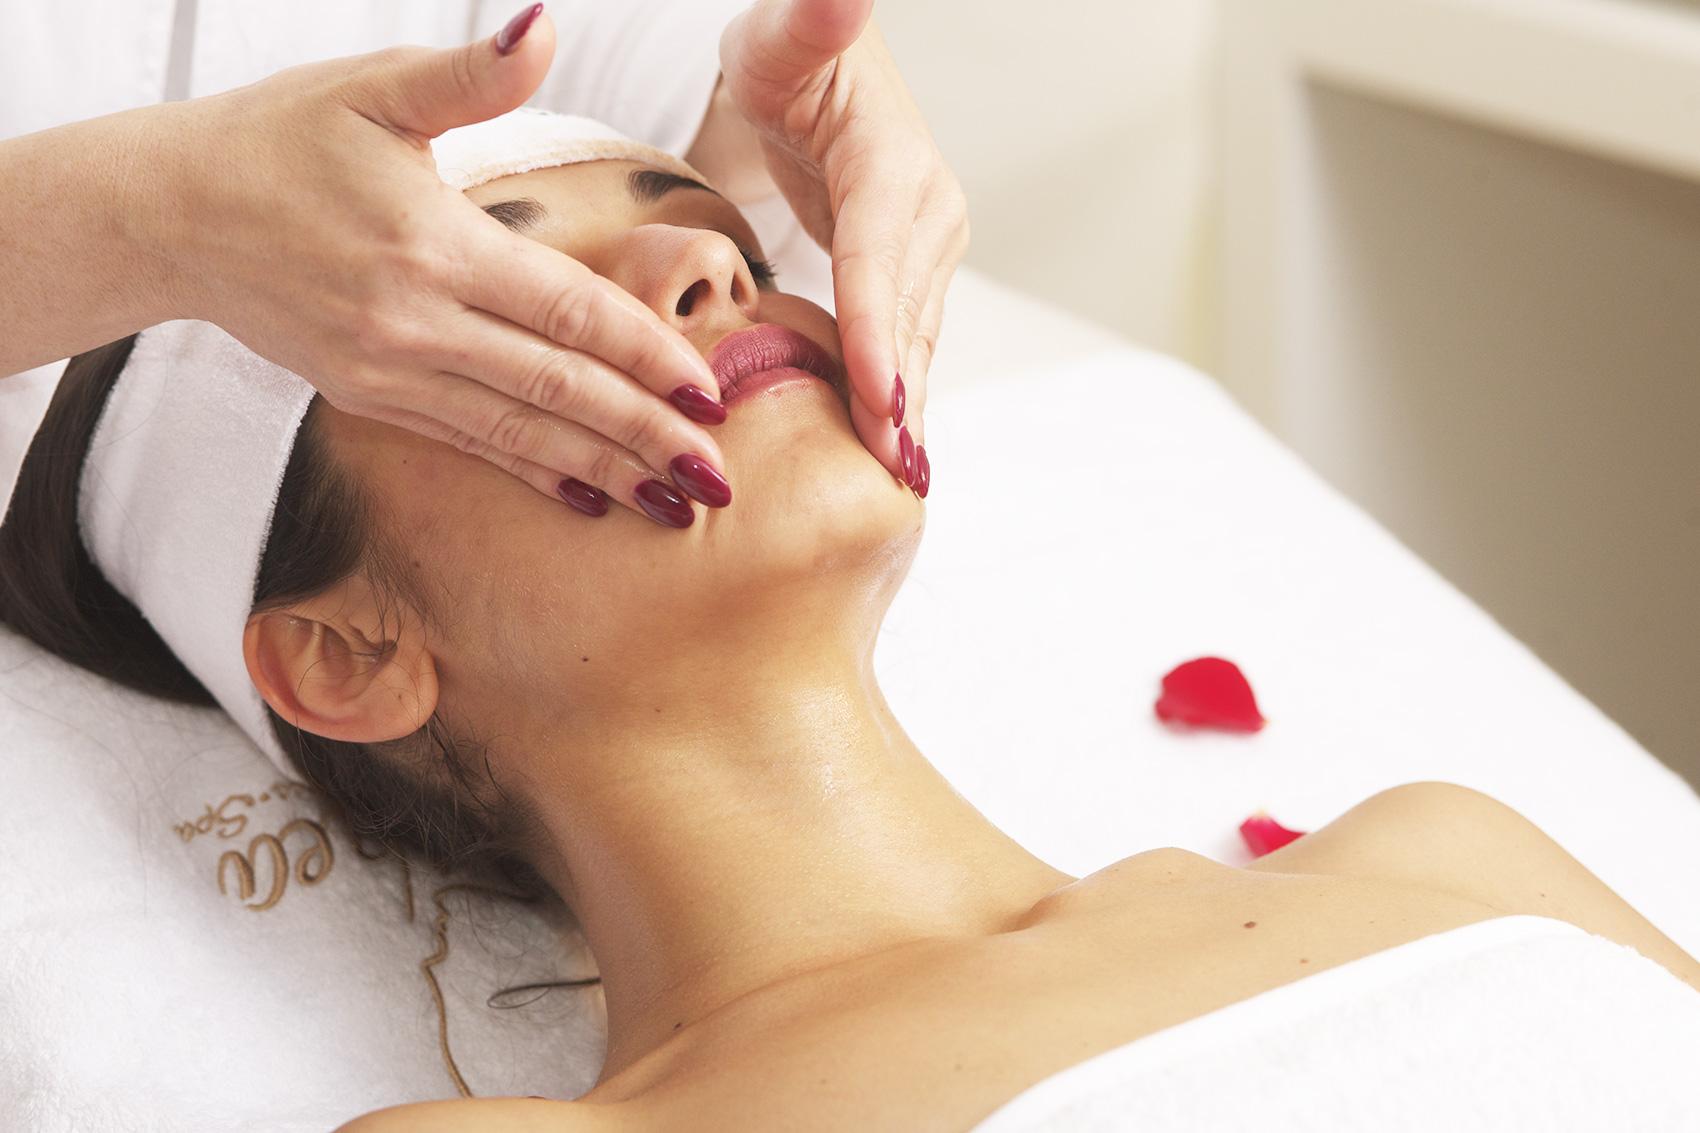 trattamento-viso-centro-estetico-taormina-anthea-2